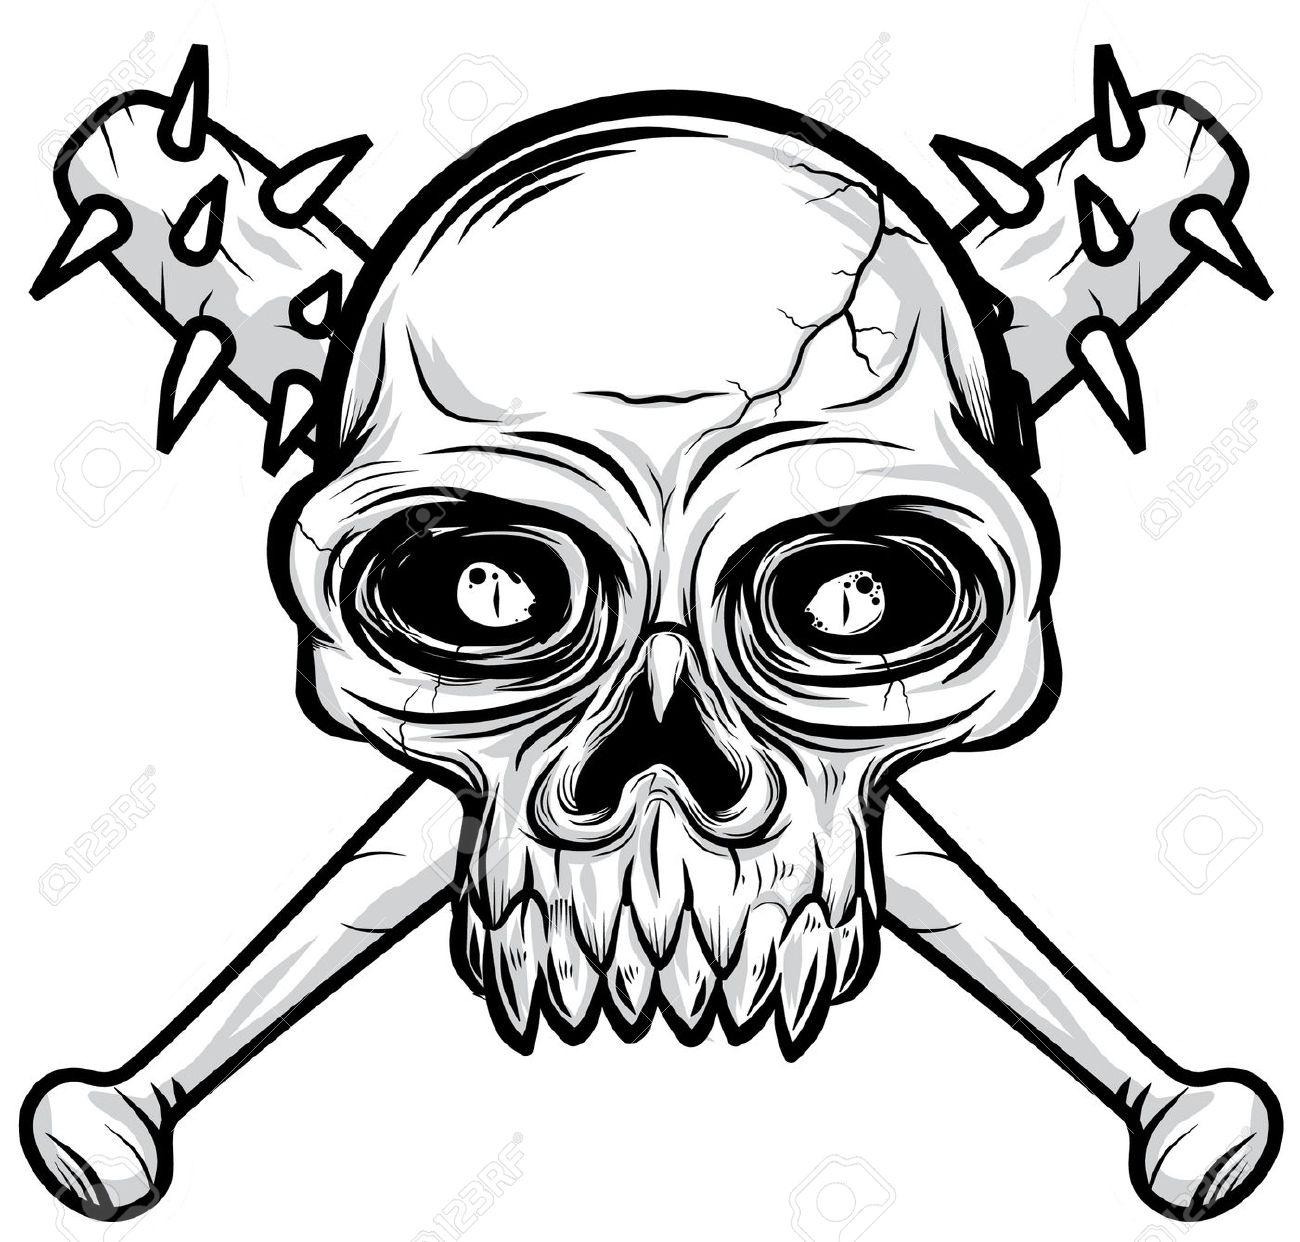 1300x1242 Skeleton Clipart Deadly